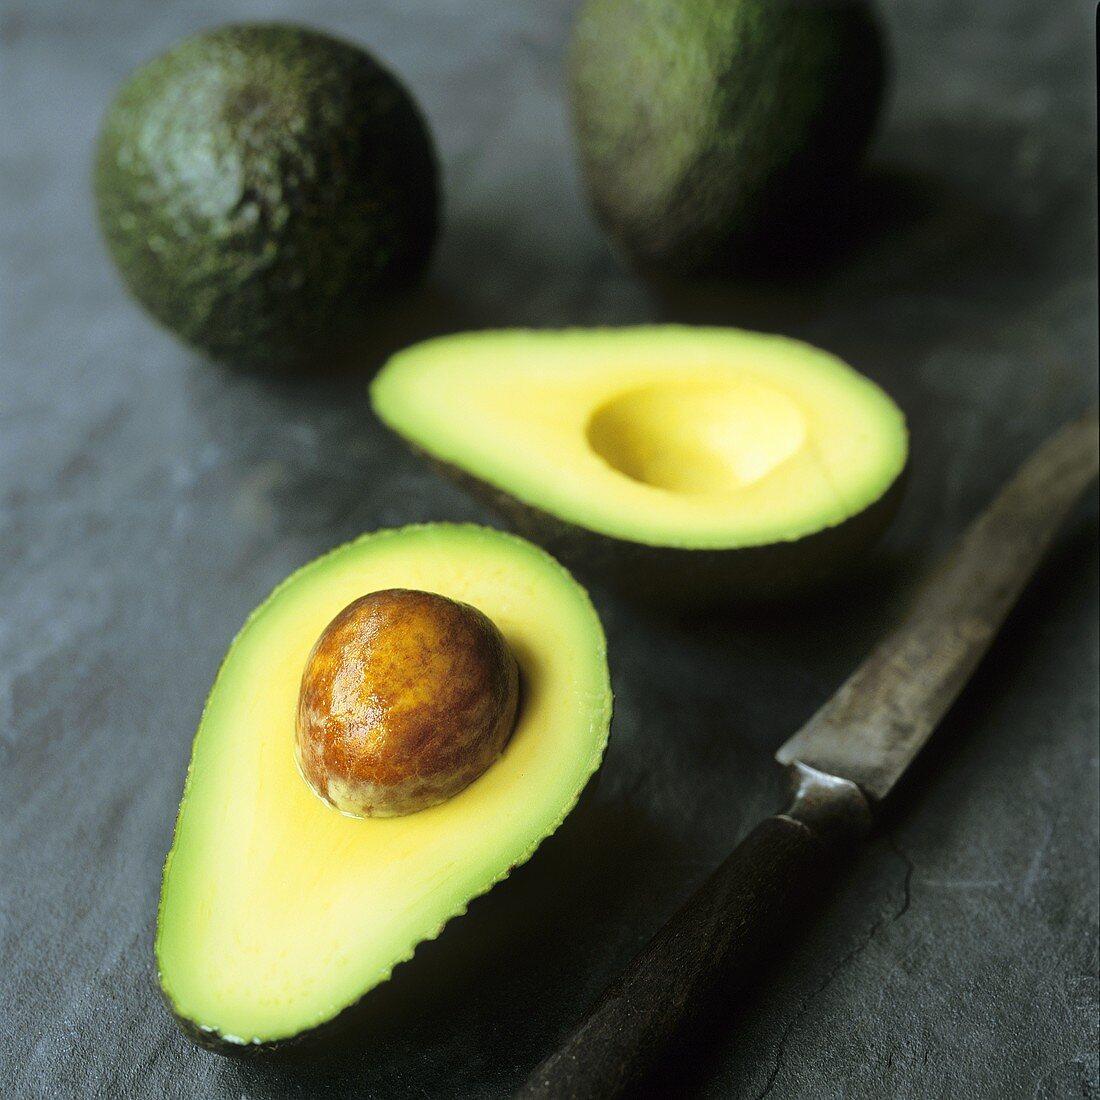 Avocado with stone